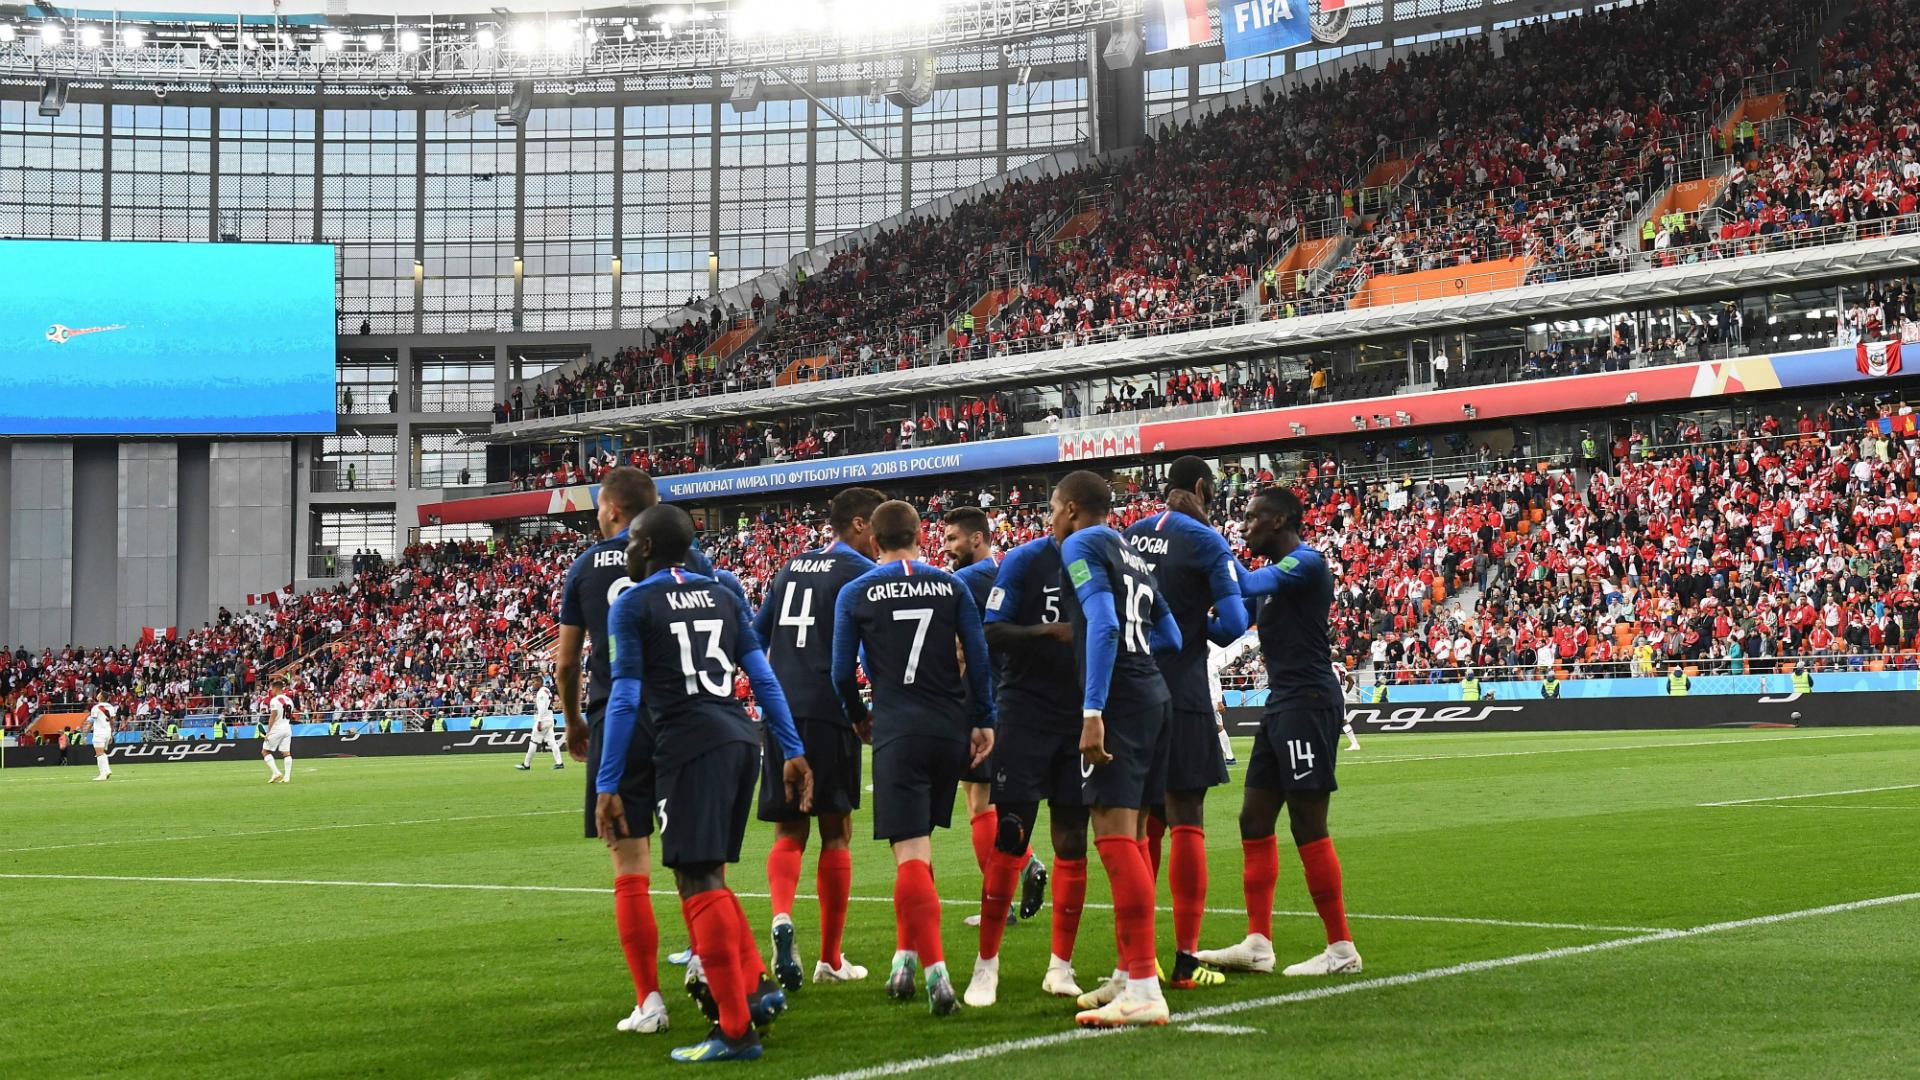 France Peru World Cup 2018 21062018.jpg